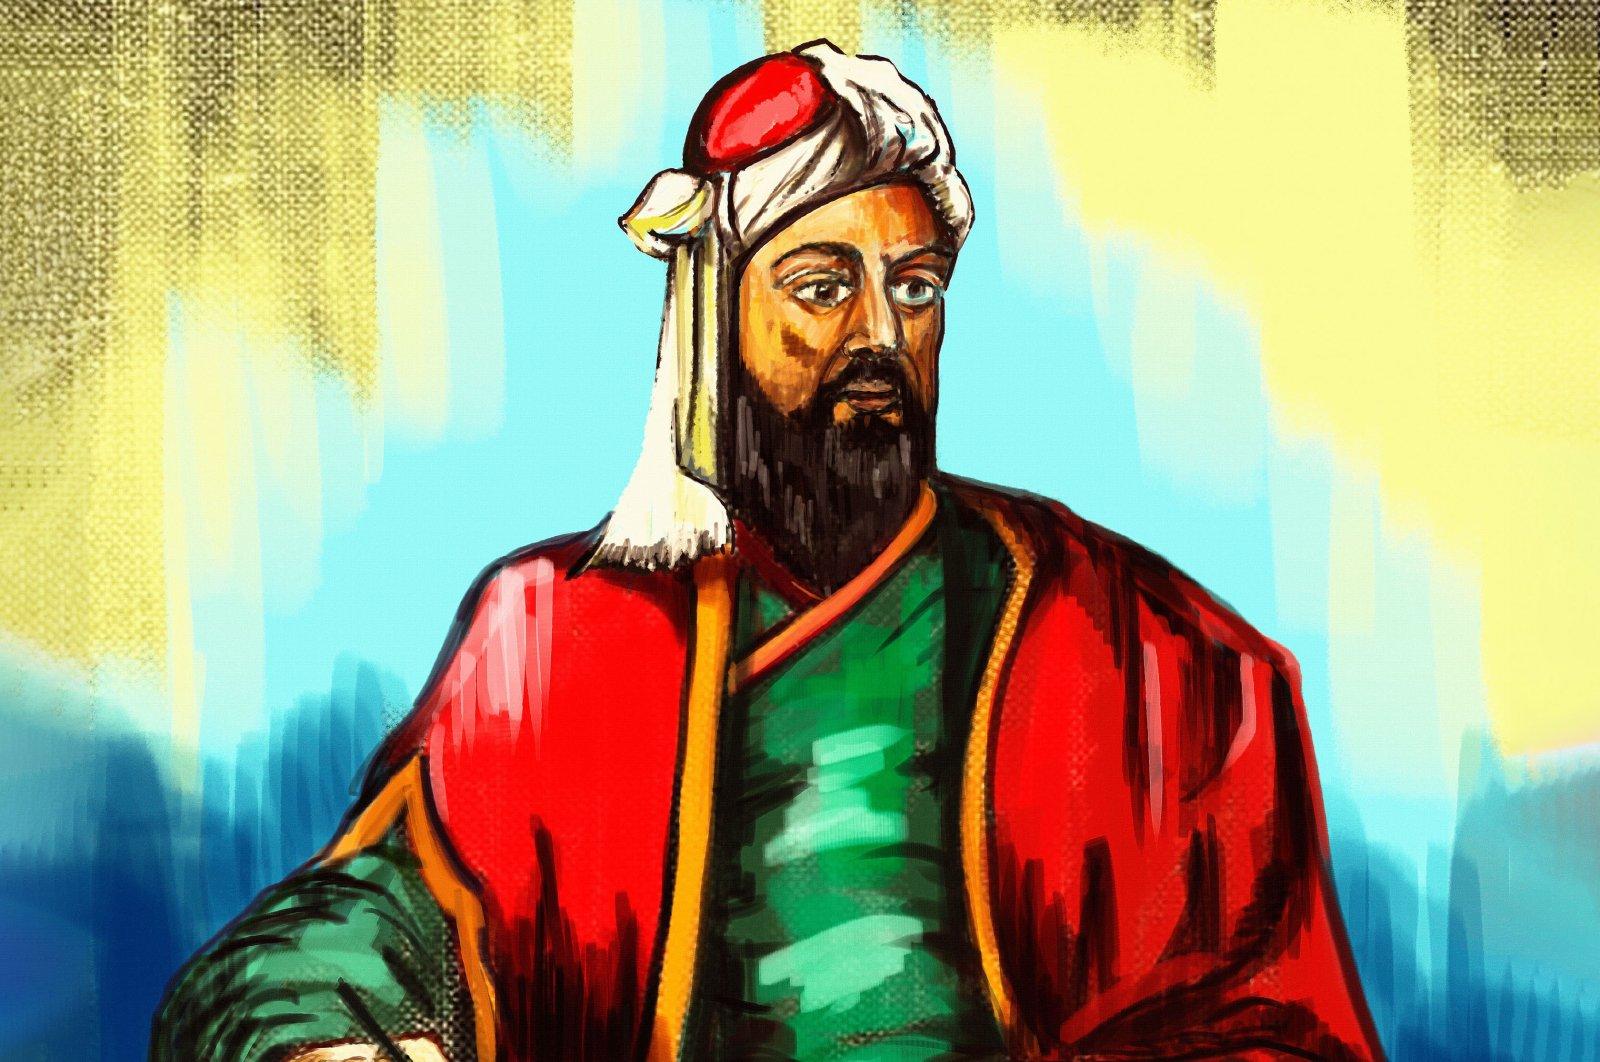 A painting depicts the likeness of Nizam al-Mulk, 11-th centurystatesman and vizier of theSeljuk Empire. (Shutterstock Photo)